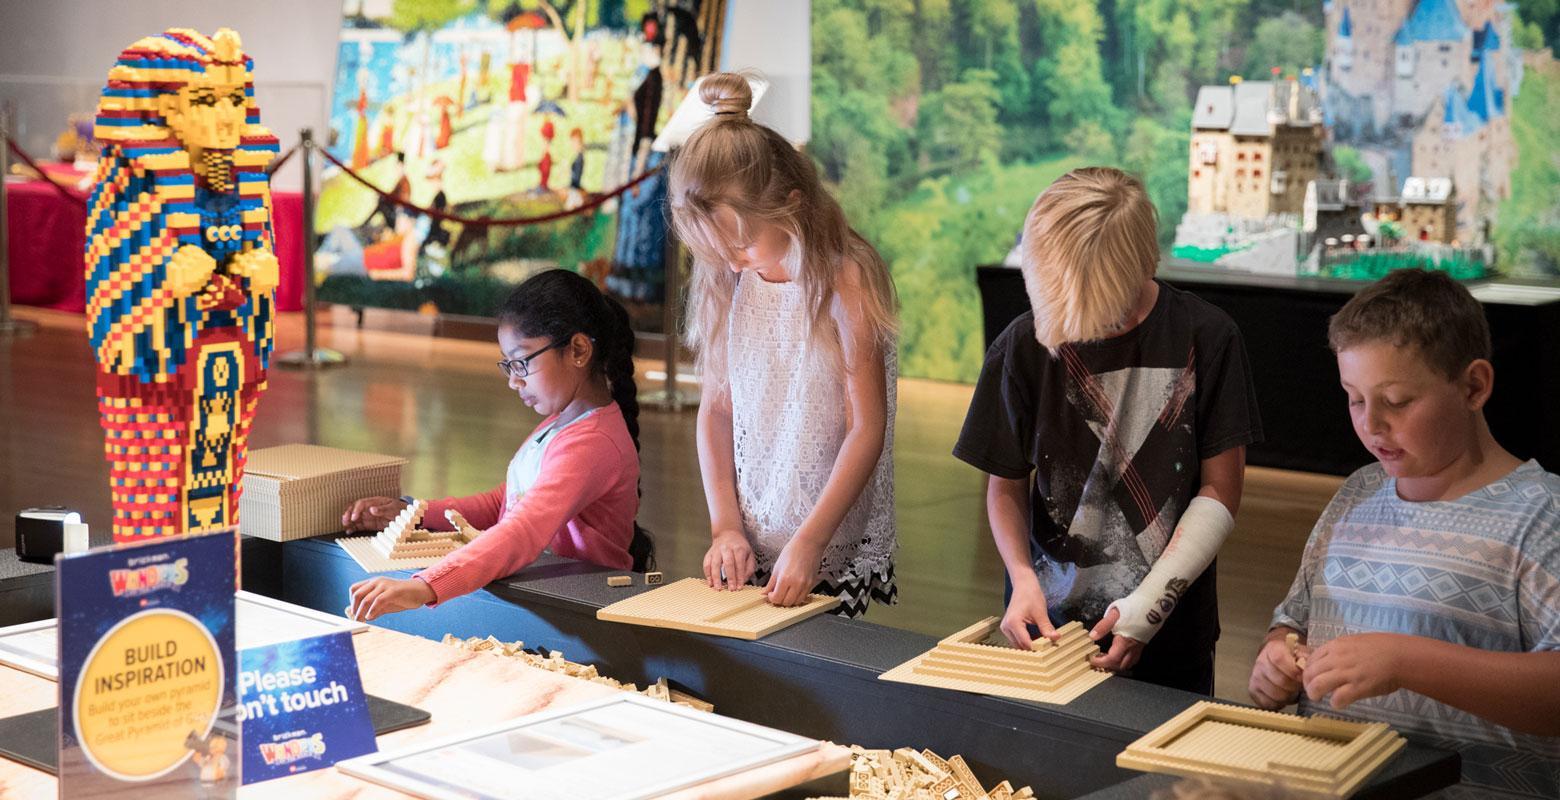 Children building LEGO pyramids